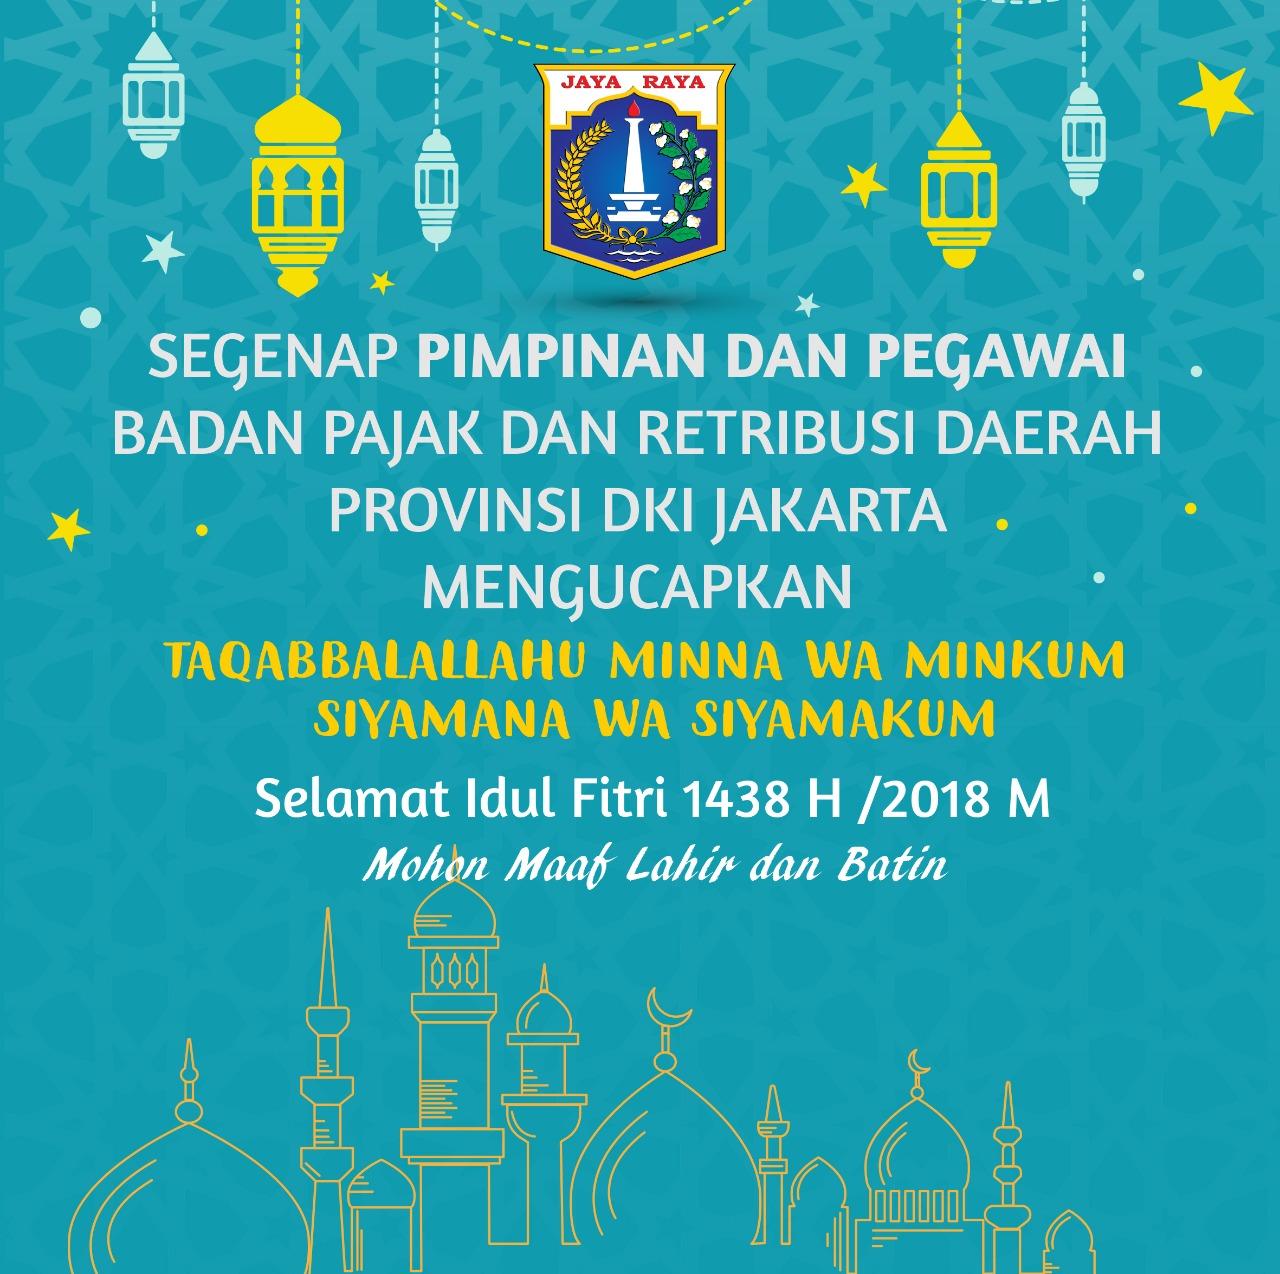 Selamat Idul Fitri 1439 H Mohon Maaf Lahir dan Bathin